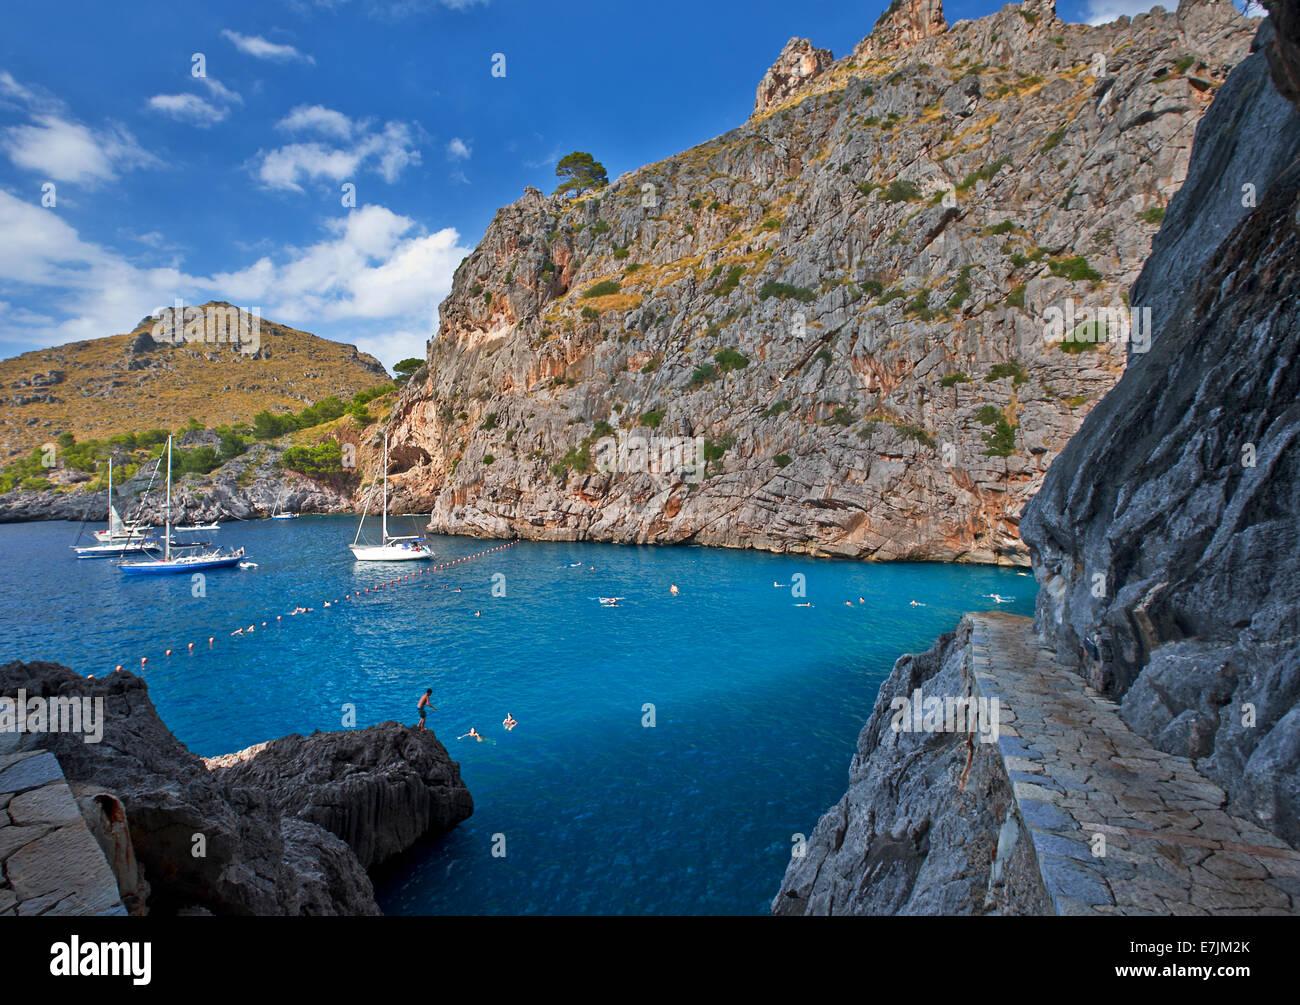 Road to Sa Calobra canyon.Majorca, Balearic islands.Spain. - Stock Image